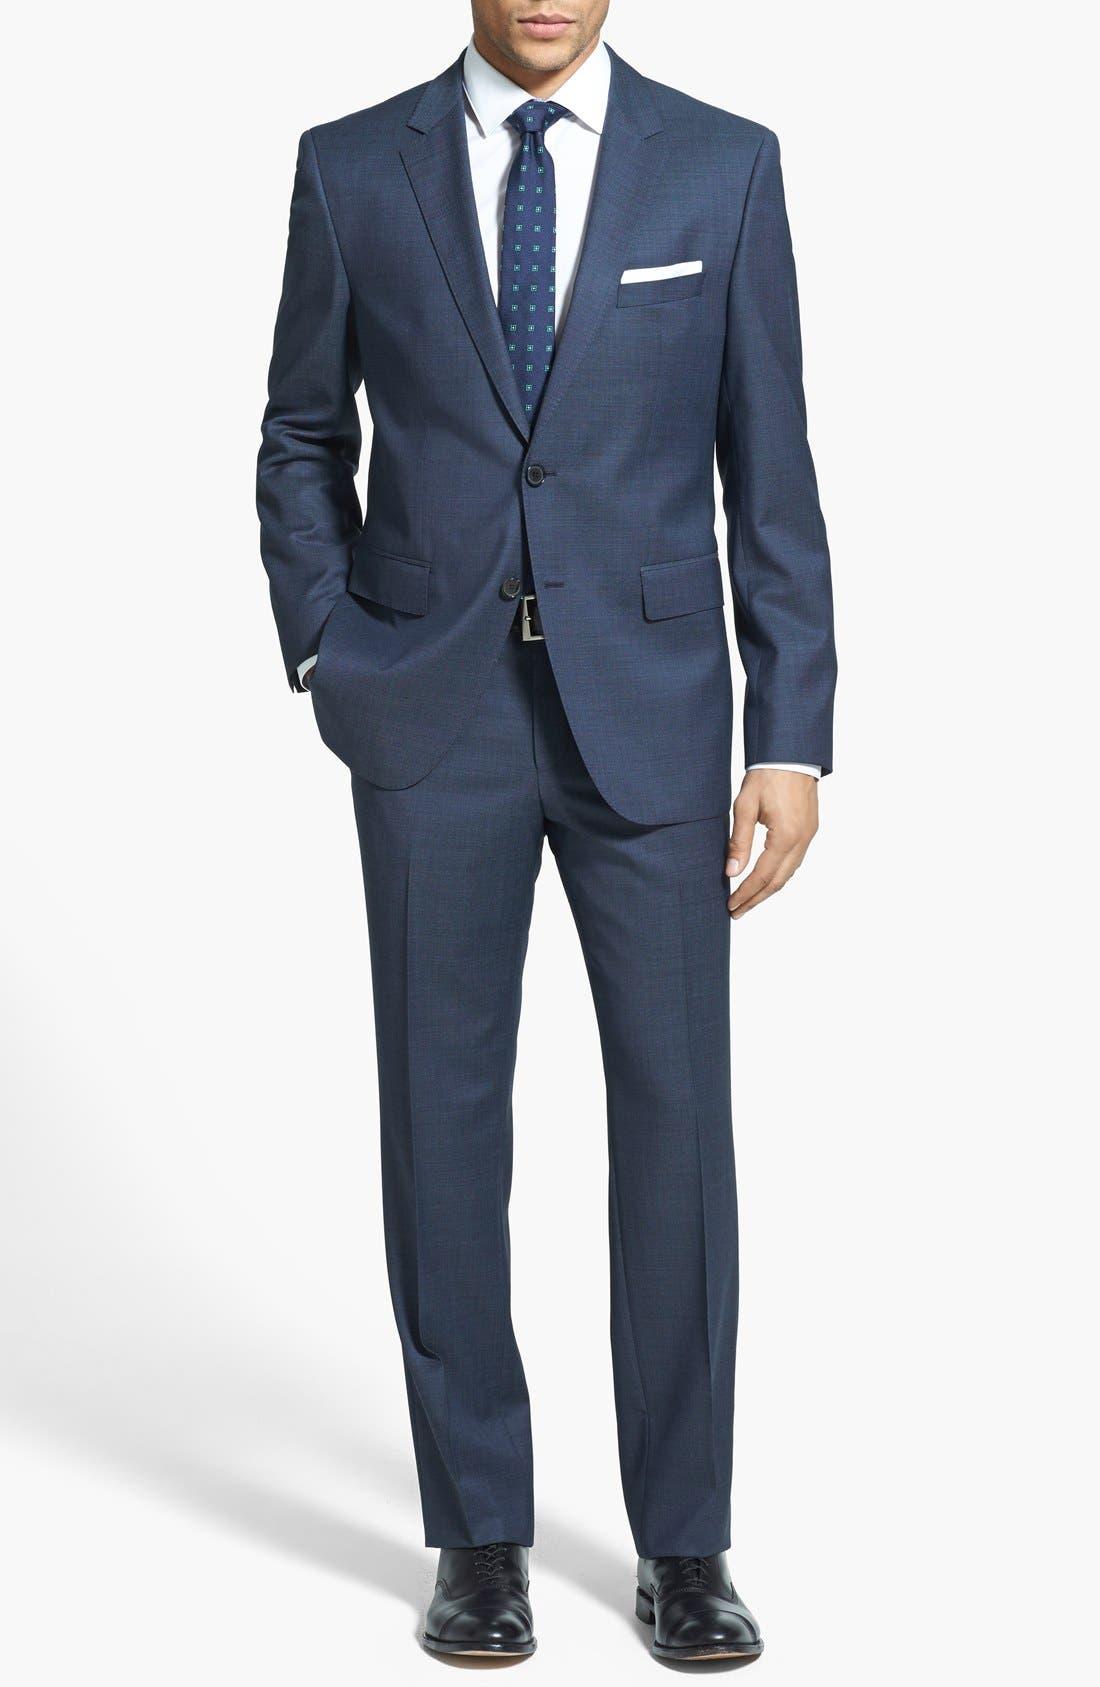 Alternate Image 1 Selected - BOSS HUGO BOSS 'James/Sharp' Trim Fit Wool Suit